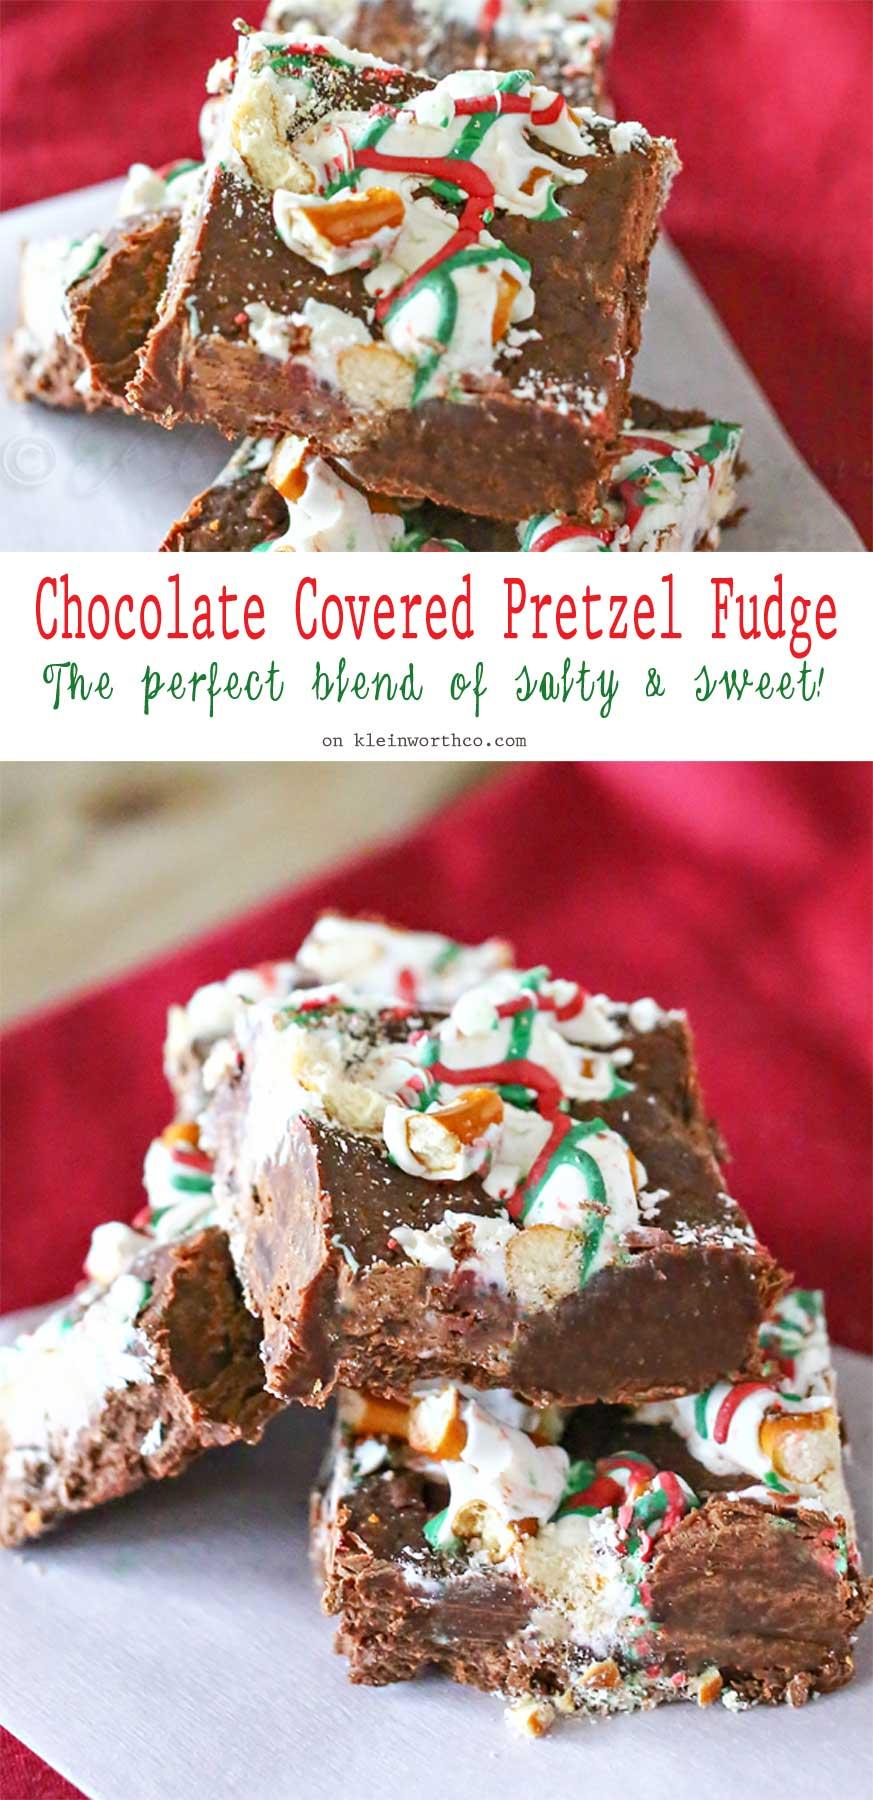 Chocolate Covered Pretzel Fudge